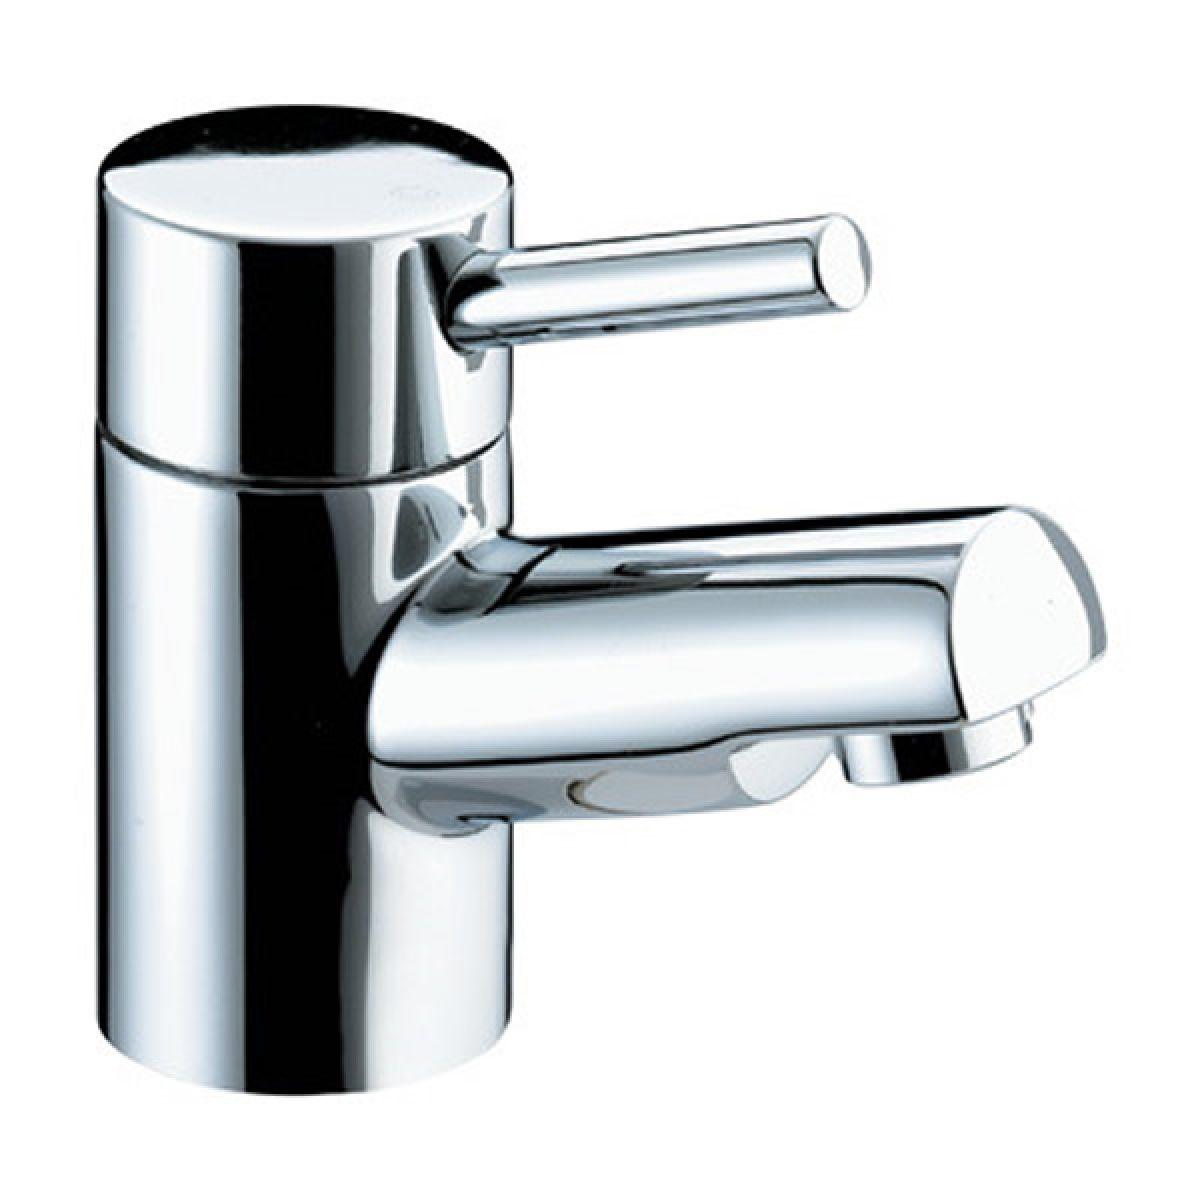 Bristan Prism Bath Shower Mixer Bathroom Wooden Panelling